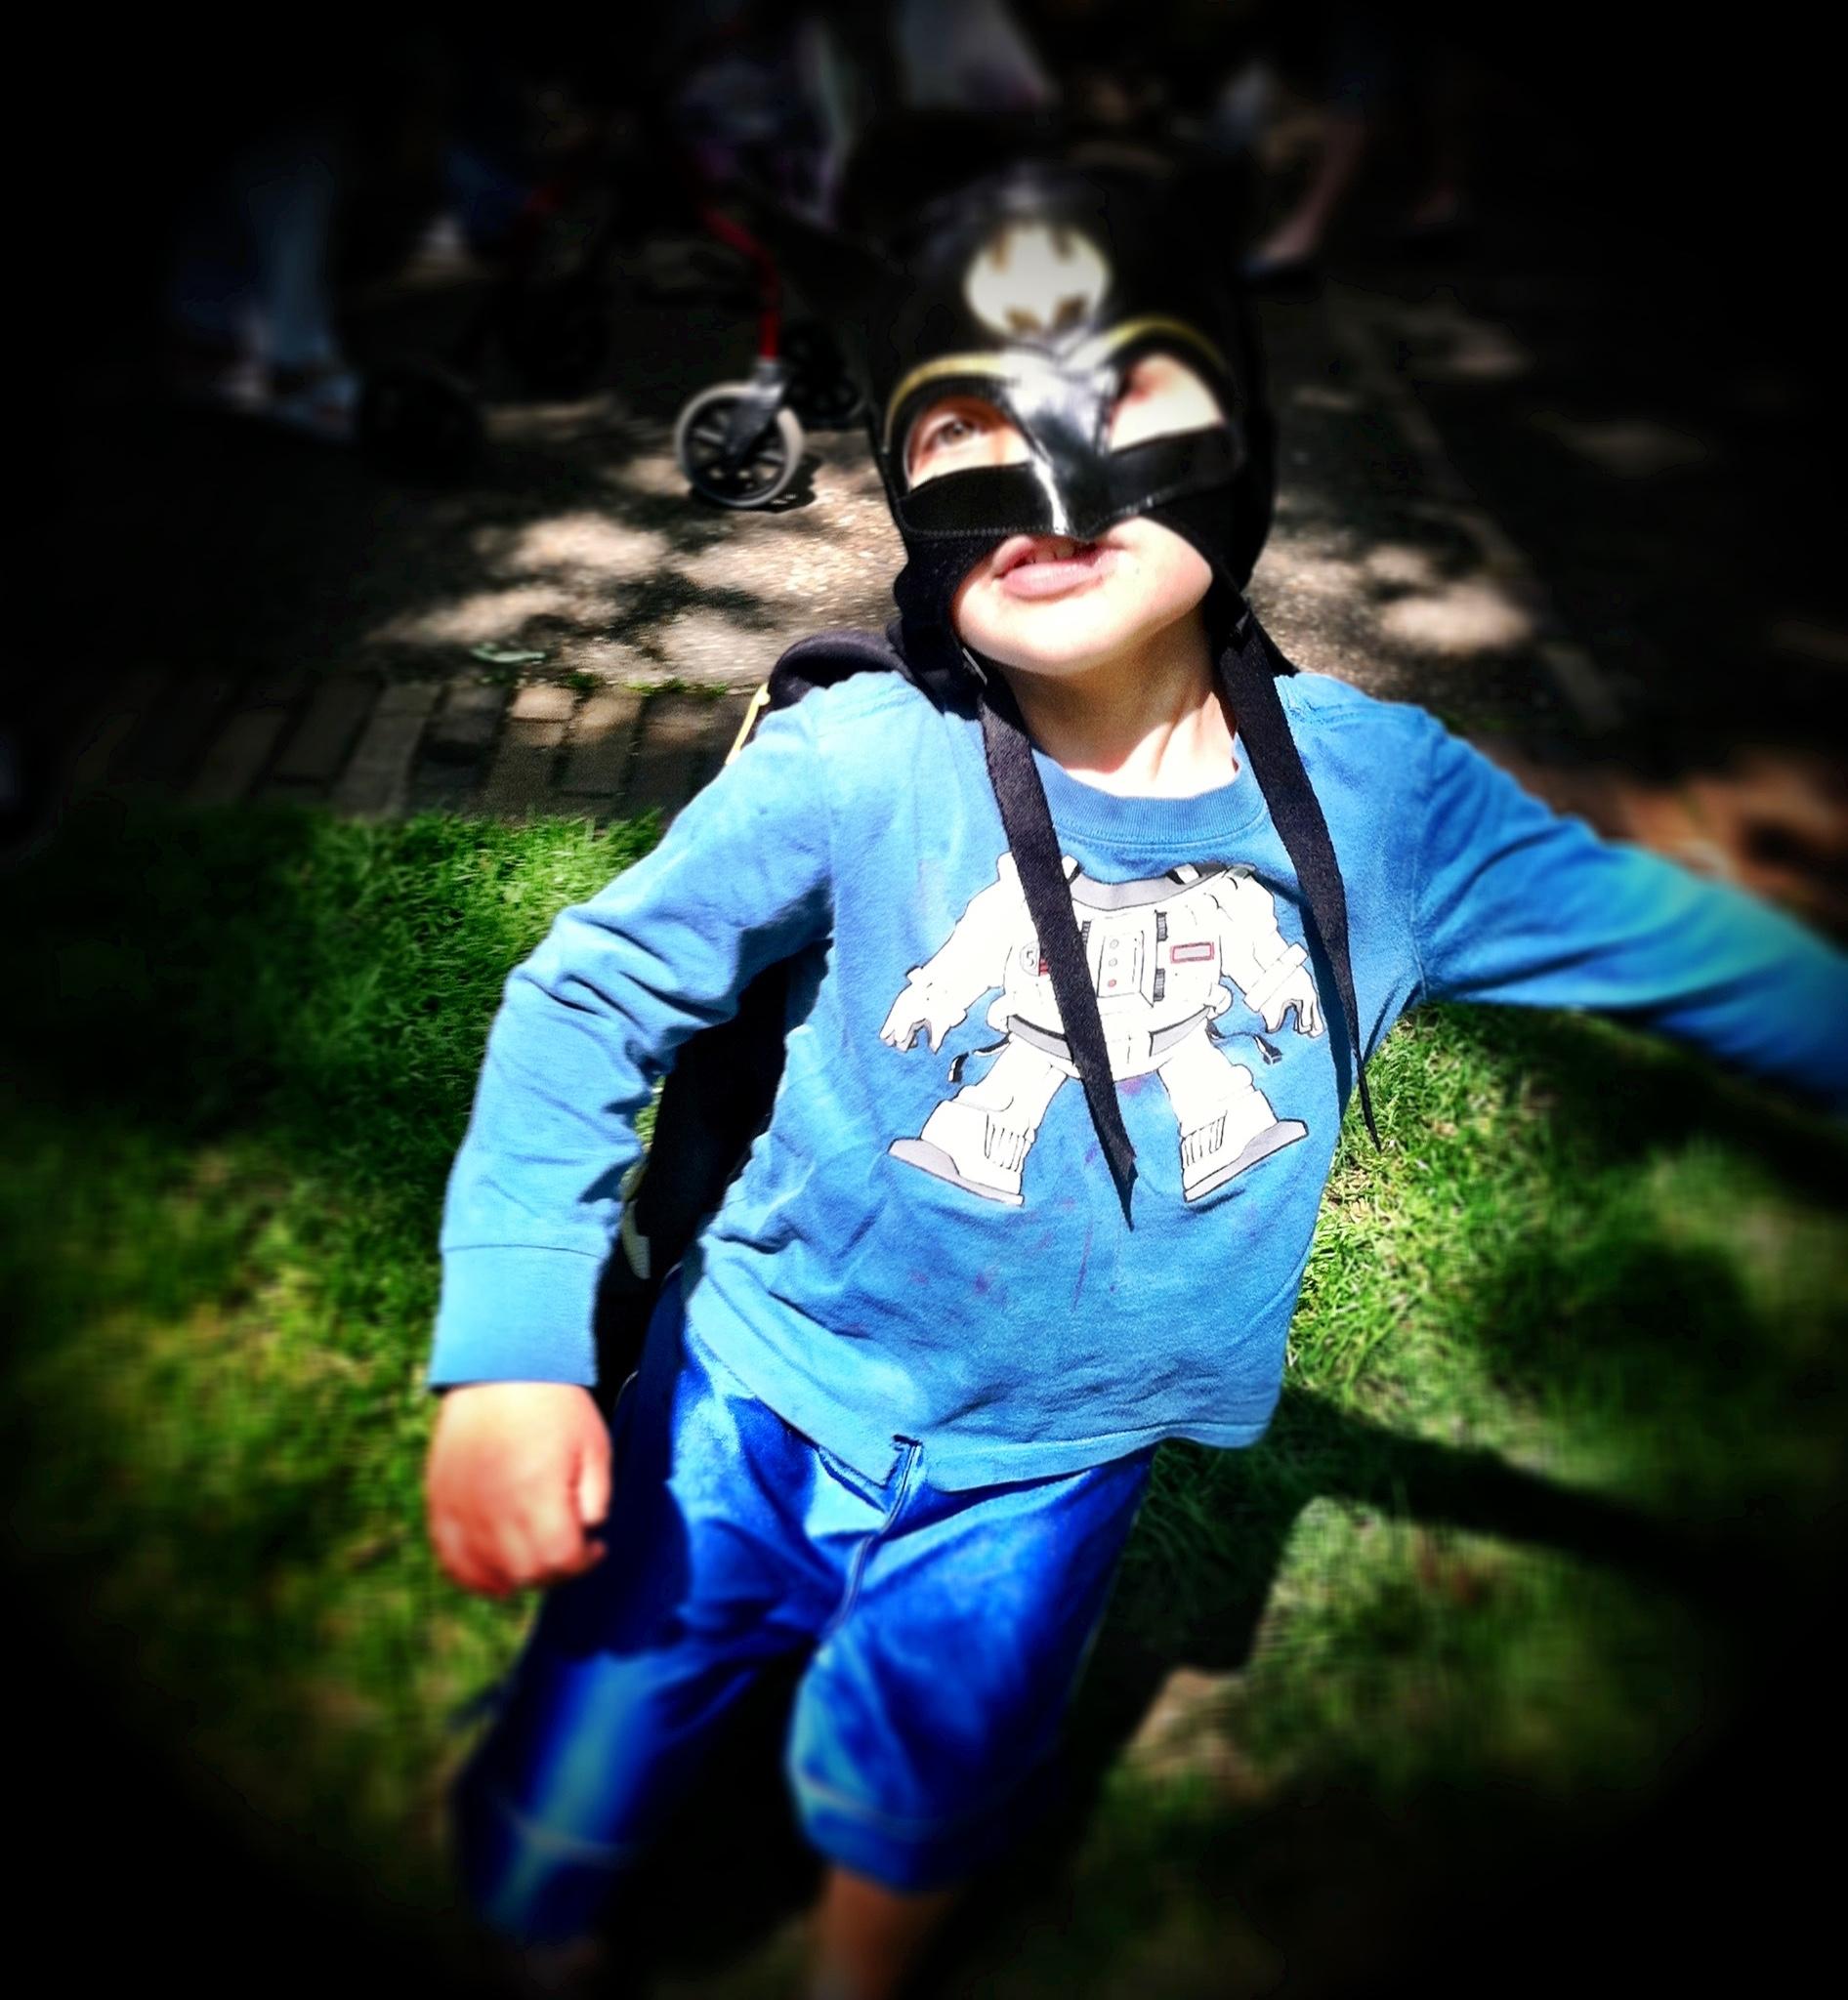 Stumptown Super Hero 2 26.2x28.4.jpg